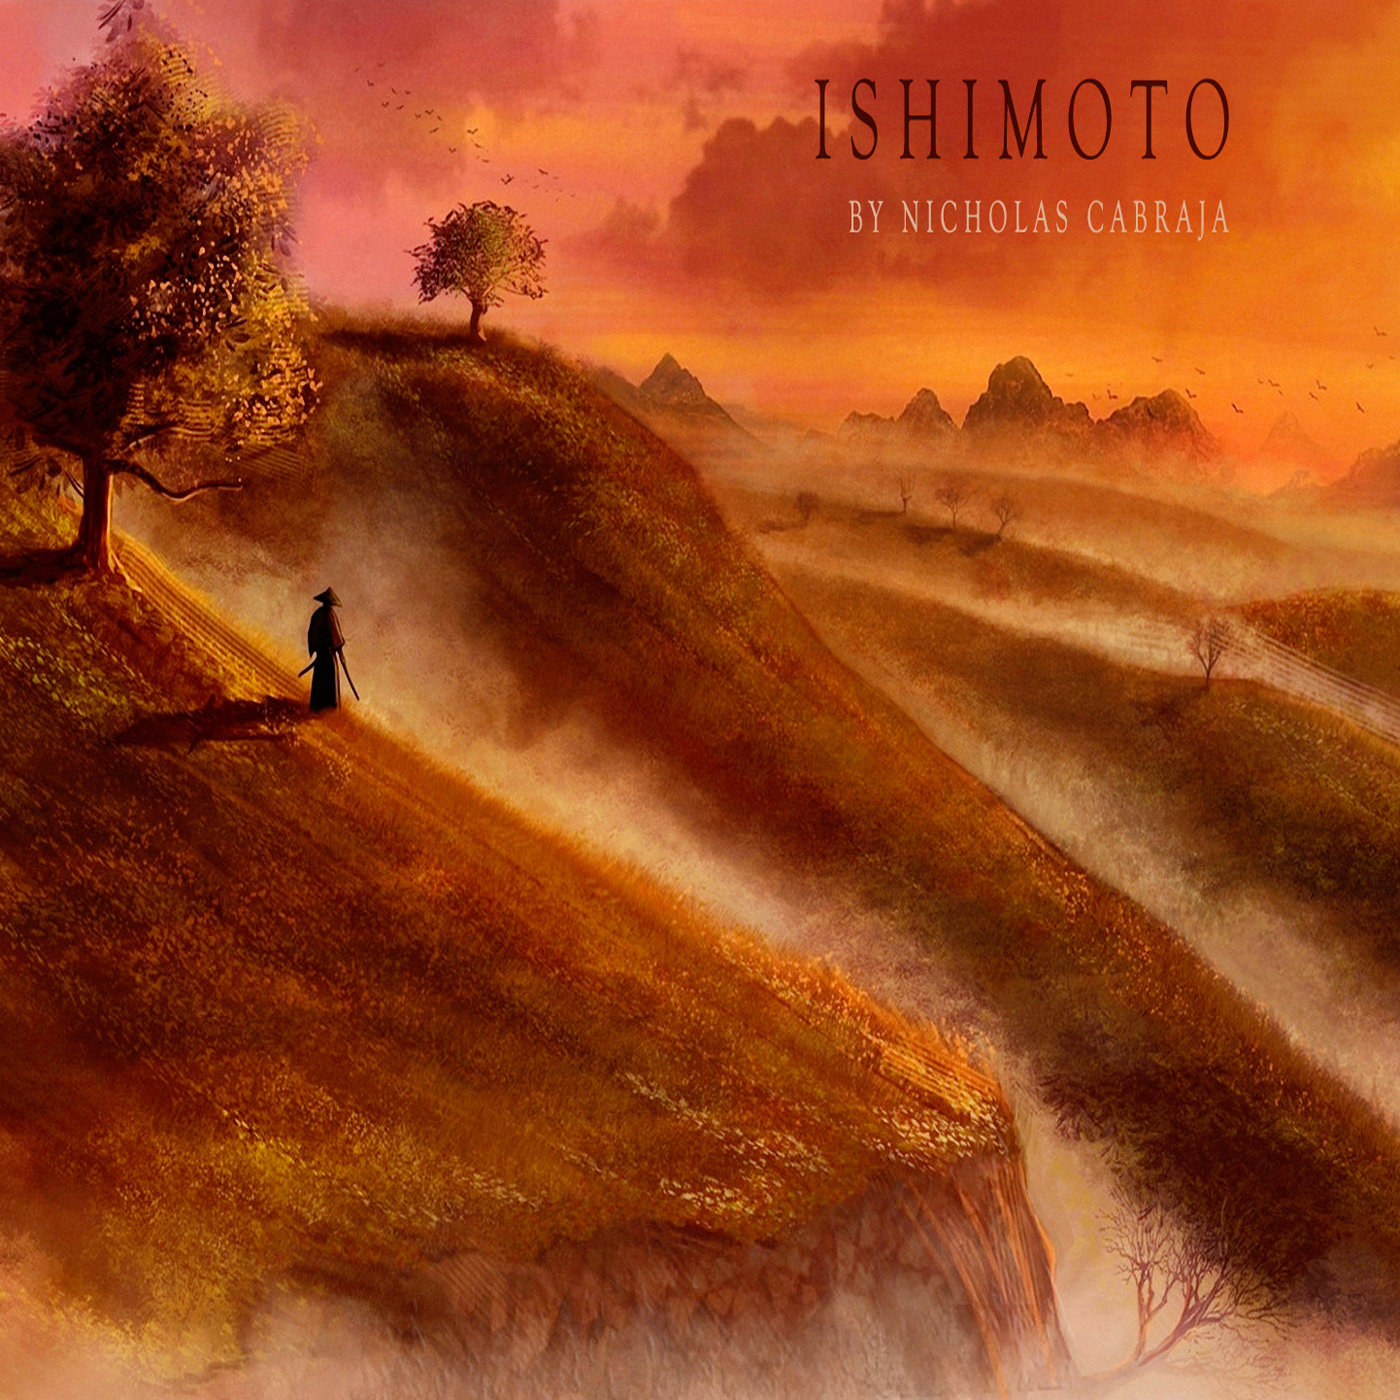 5171761_147180614651_Ishimoto-Cover.jpg